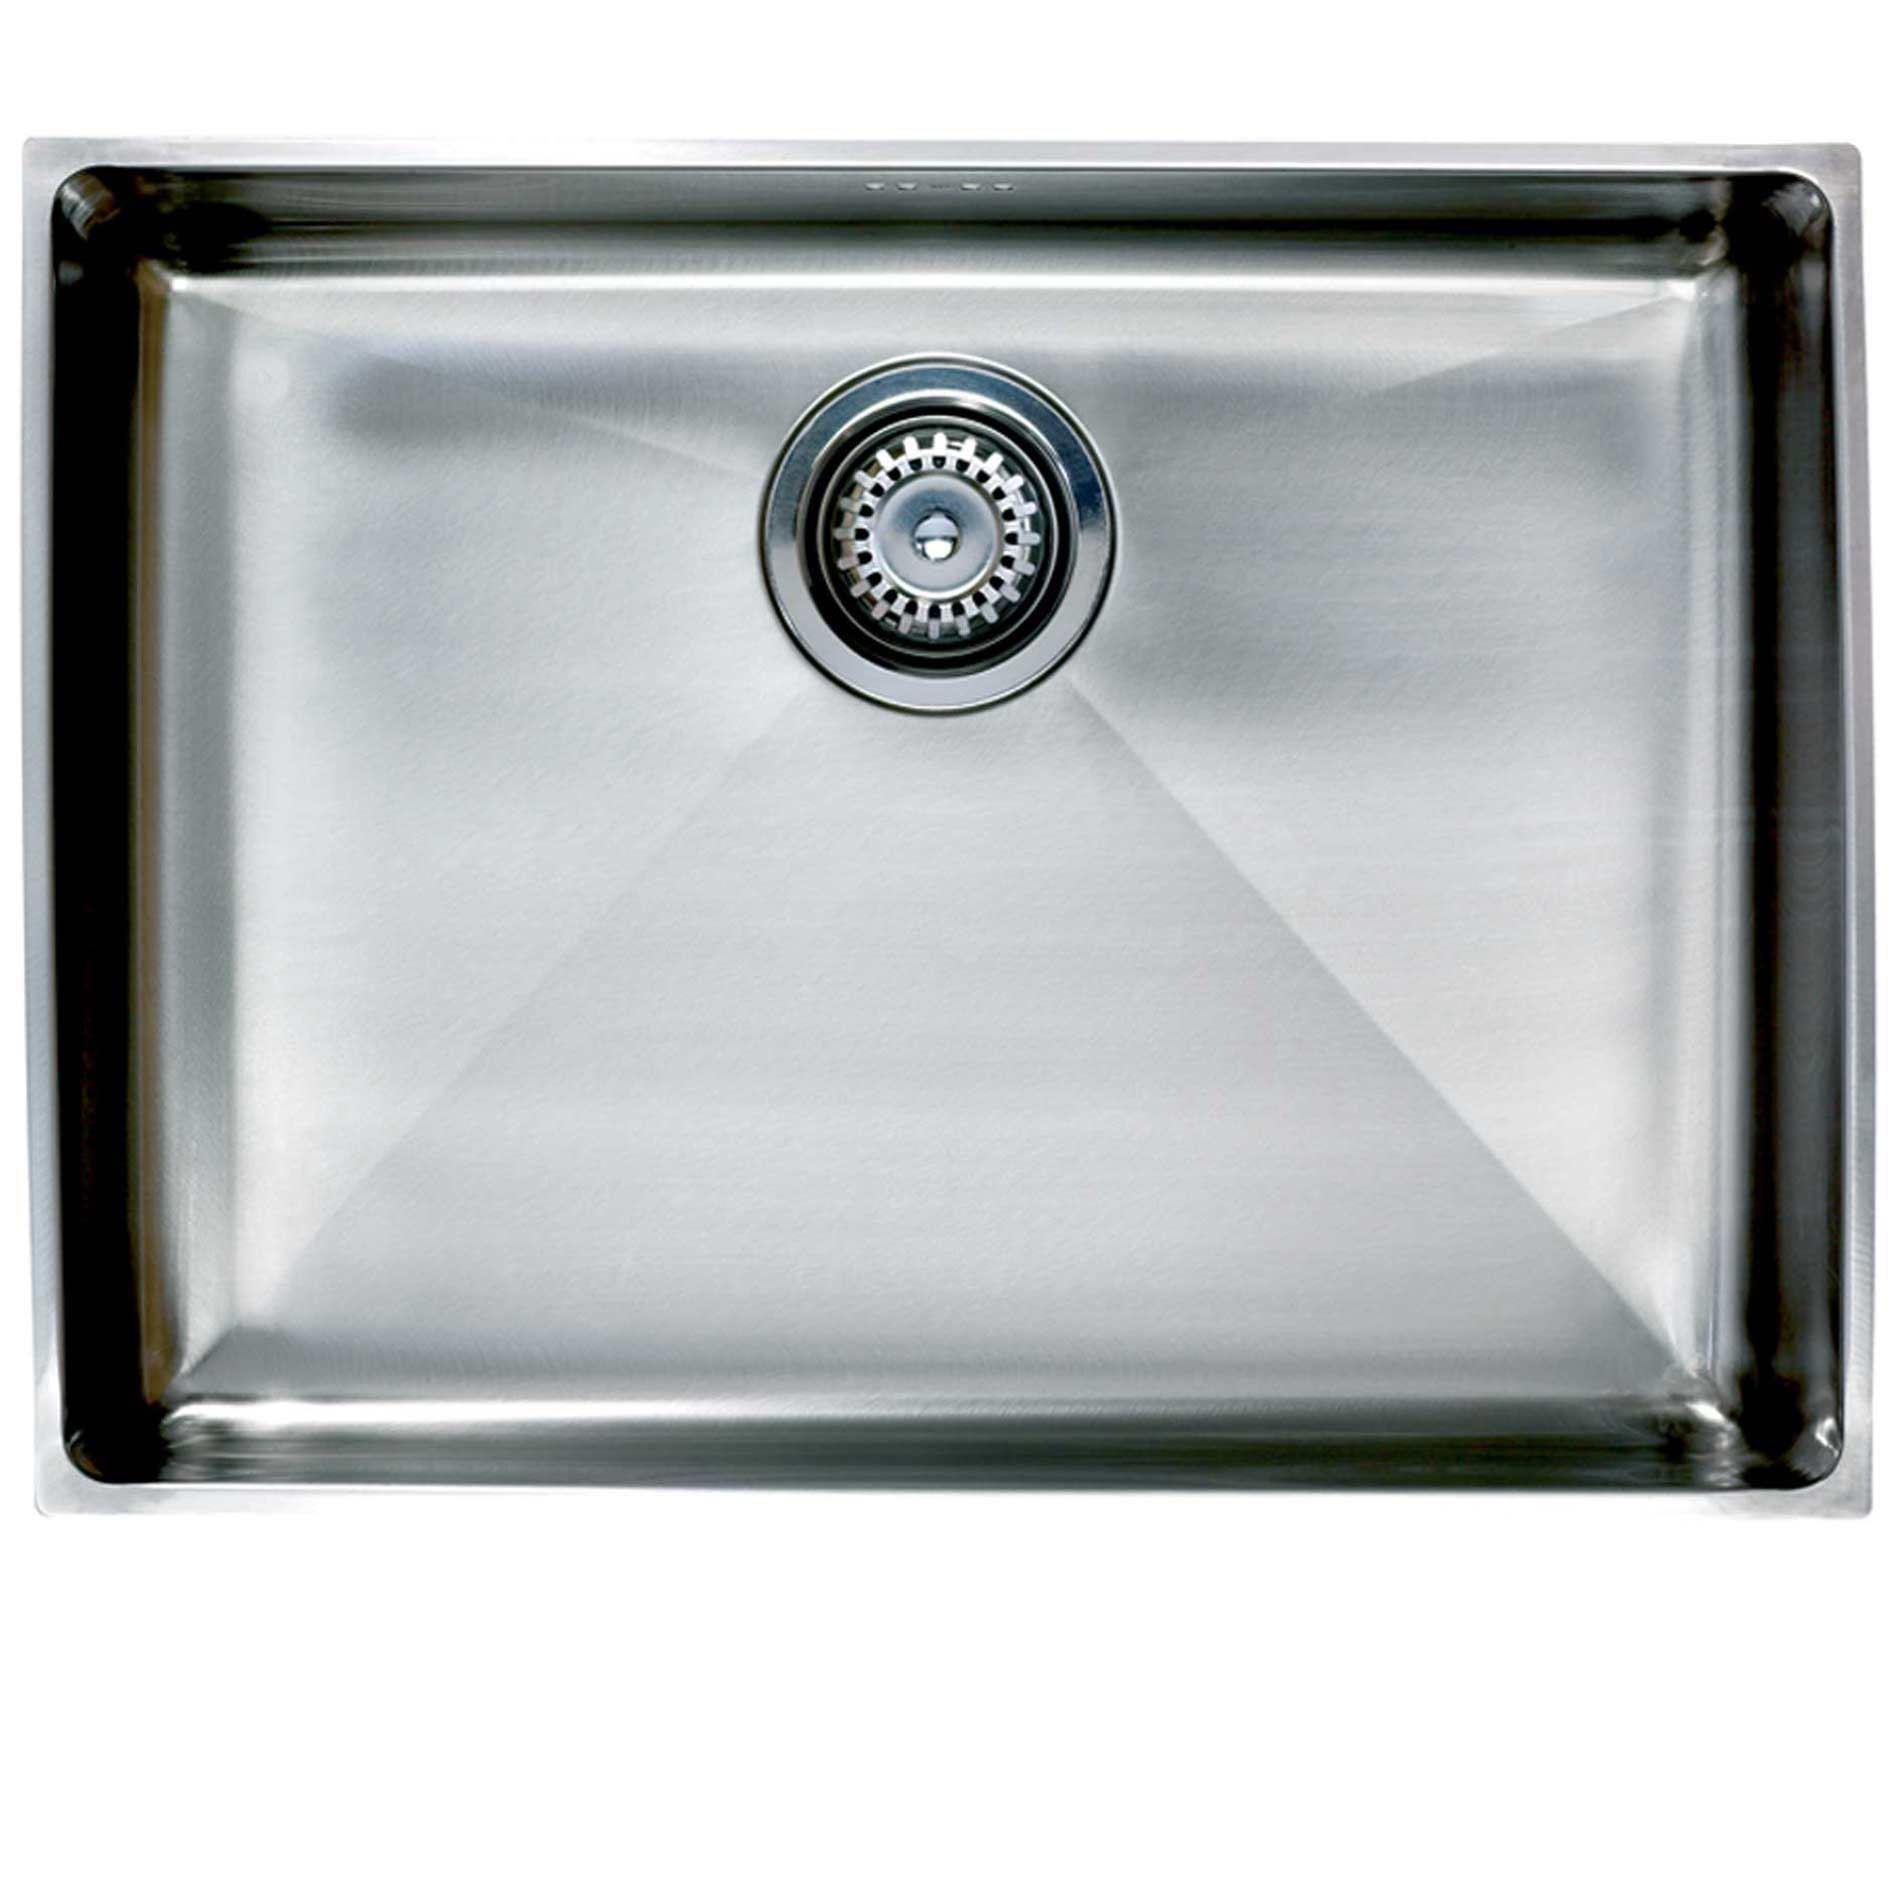 Kitchen Sinks & Taps - Astracast: Onyx 4054 Stainless Steel Sink